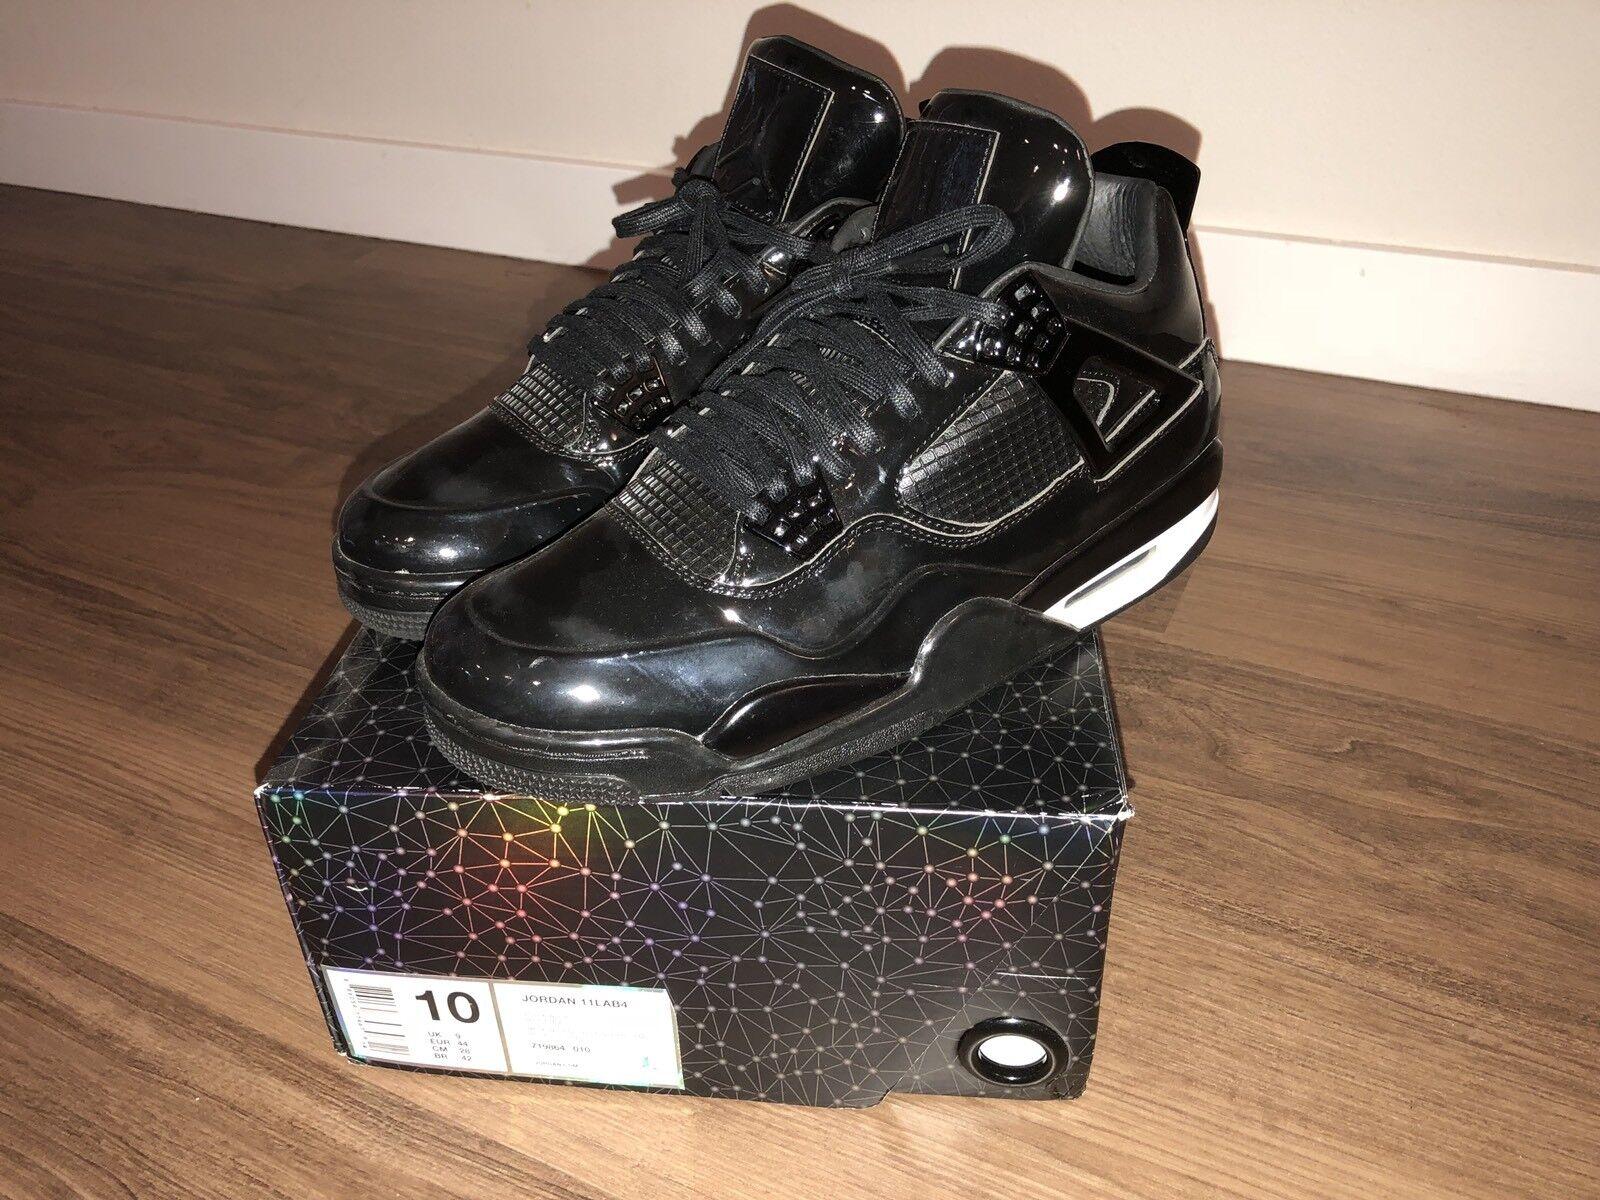 Jordan 11lab4 Black Size US 10 Used Nike Air Jordan